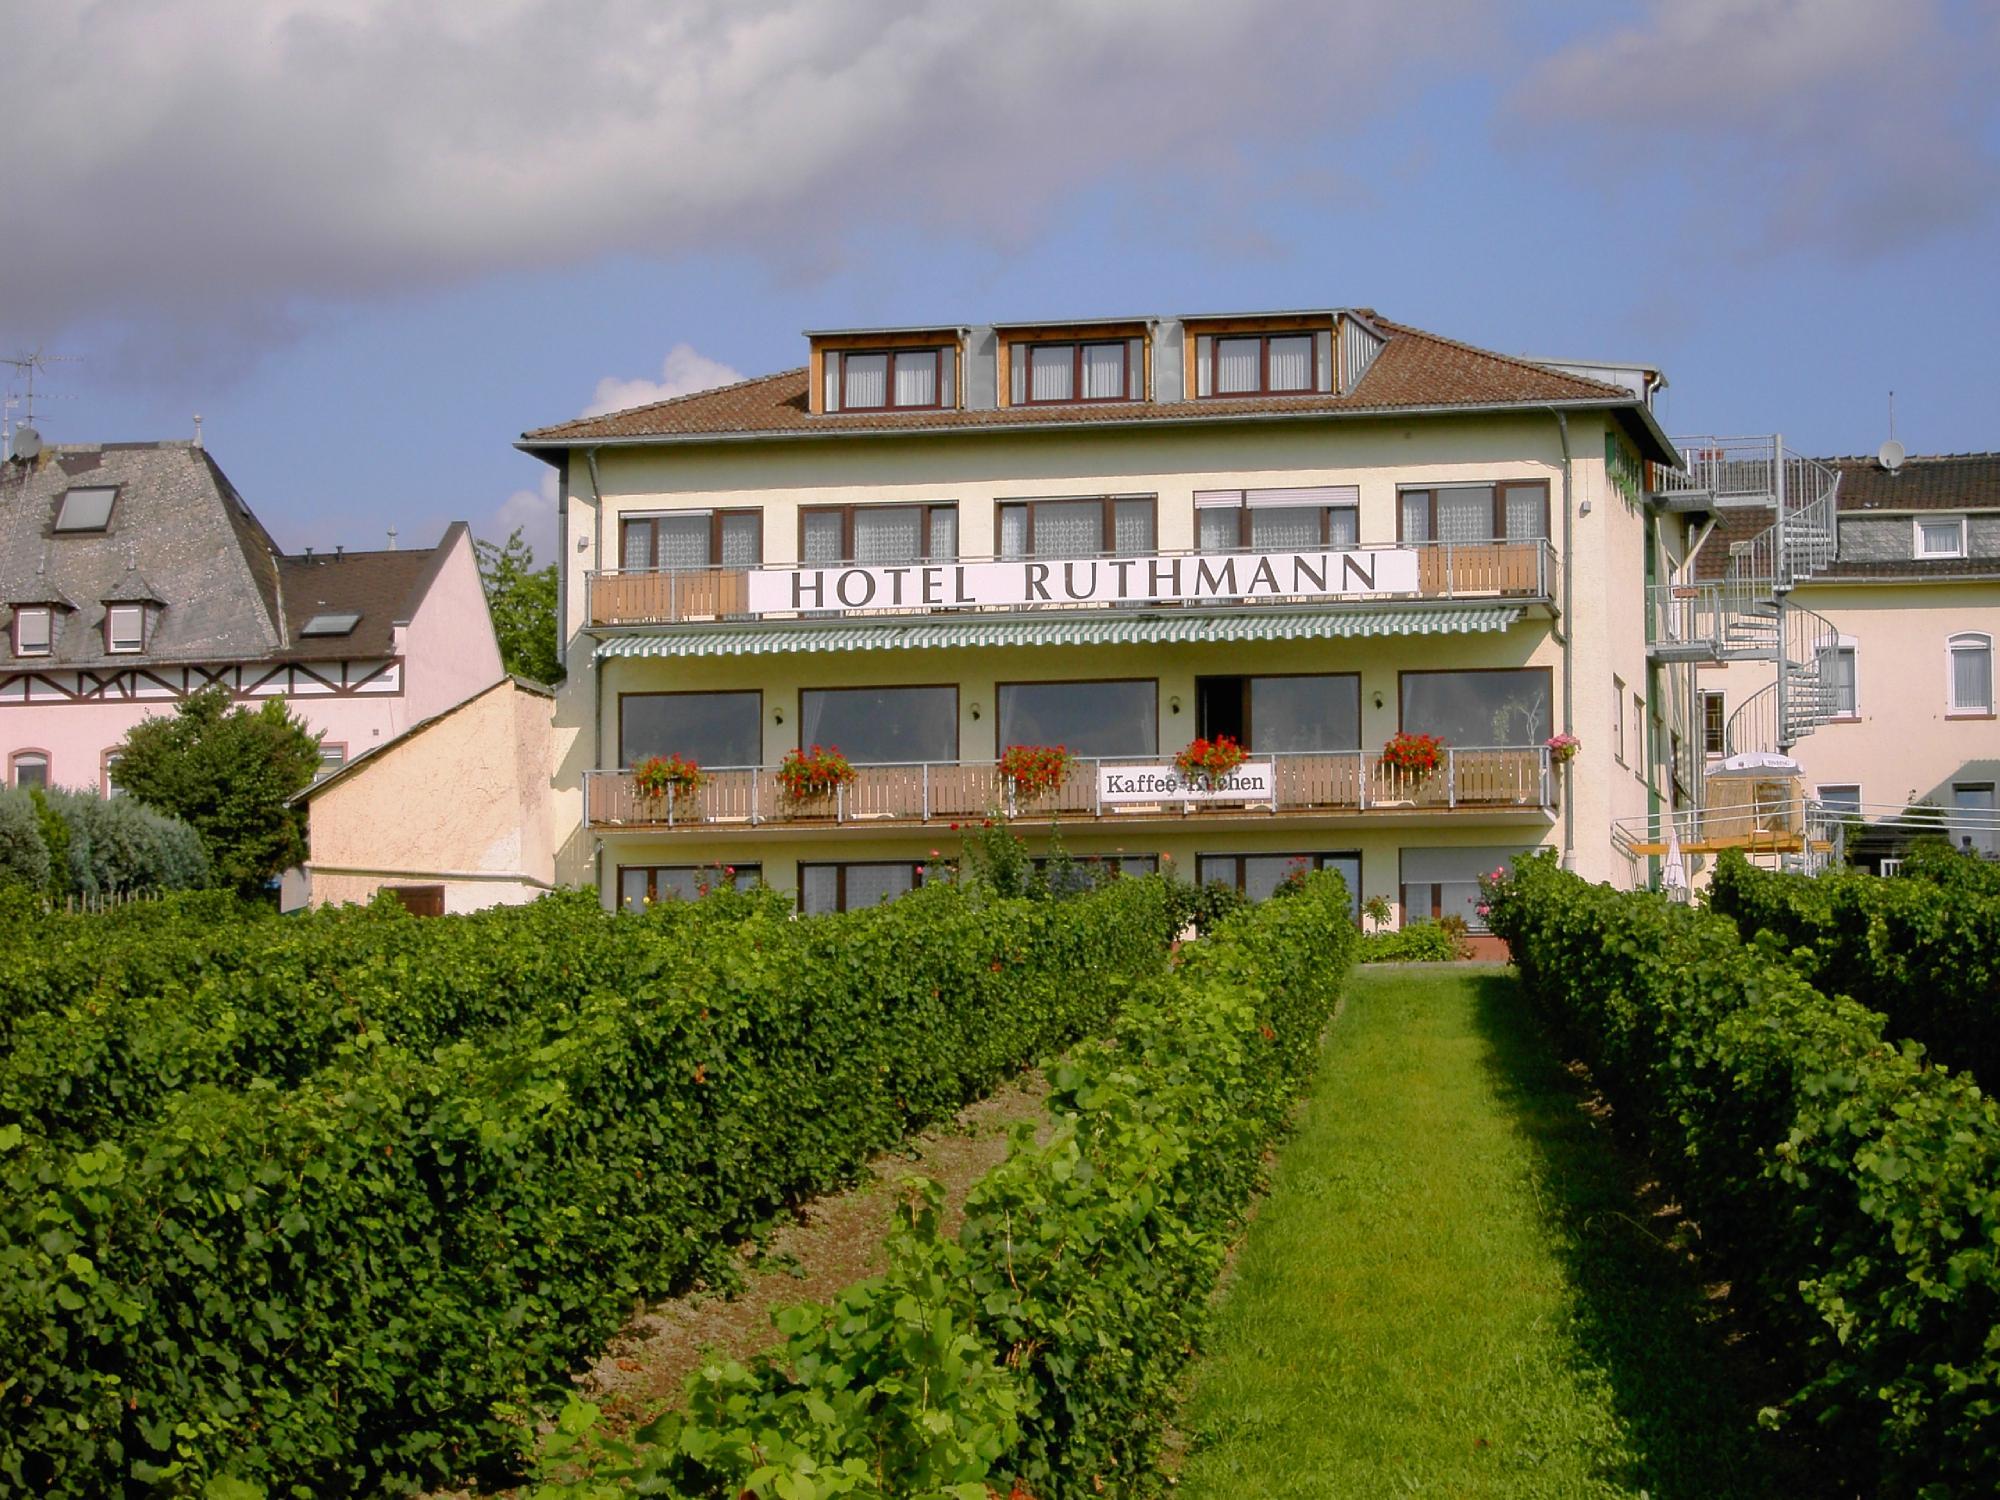 Ruthmann Hotel